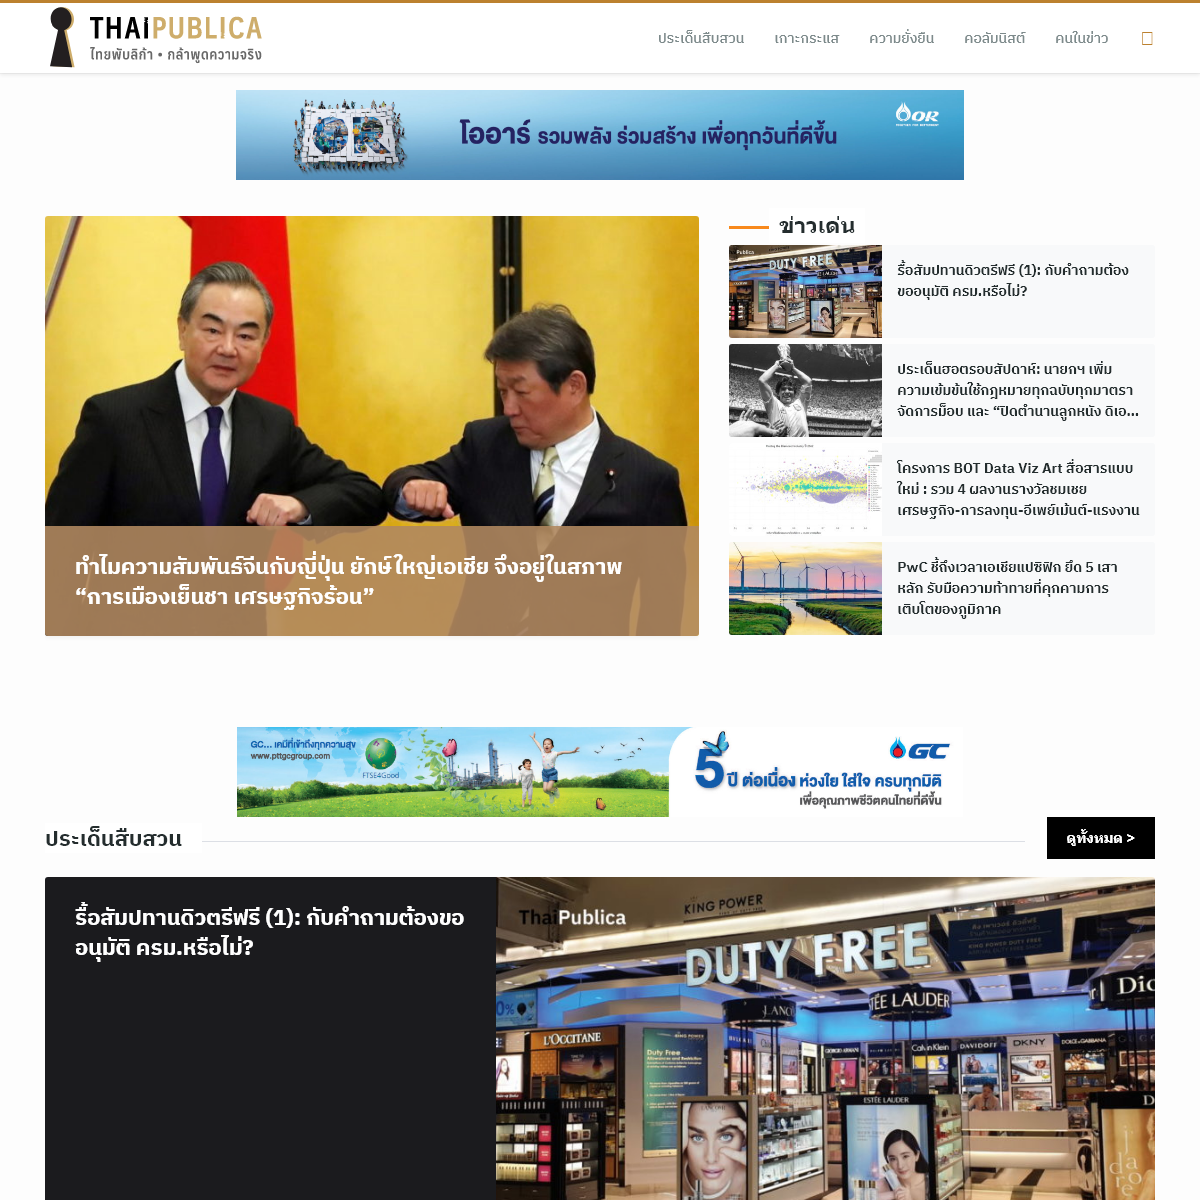 ThaiPublica - กล้าพูดความจริง